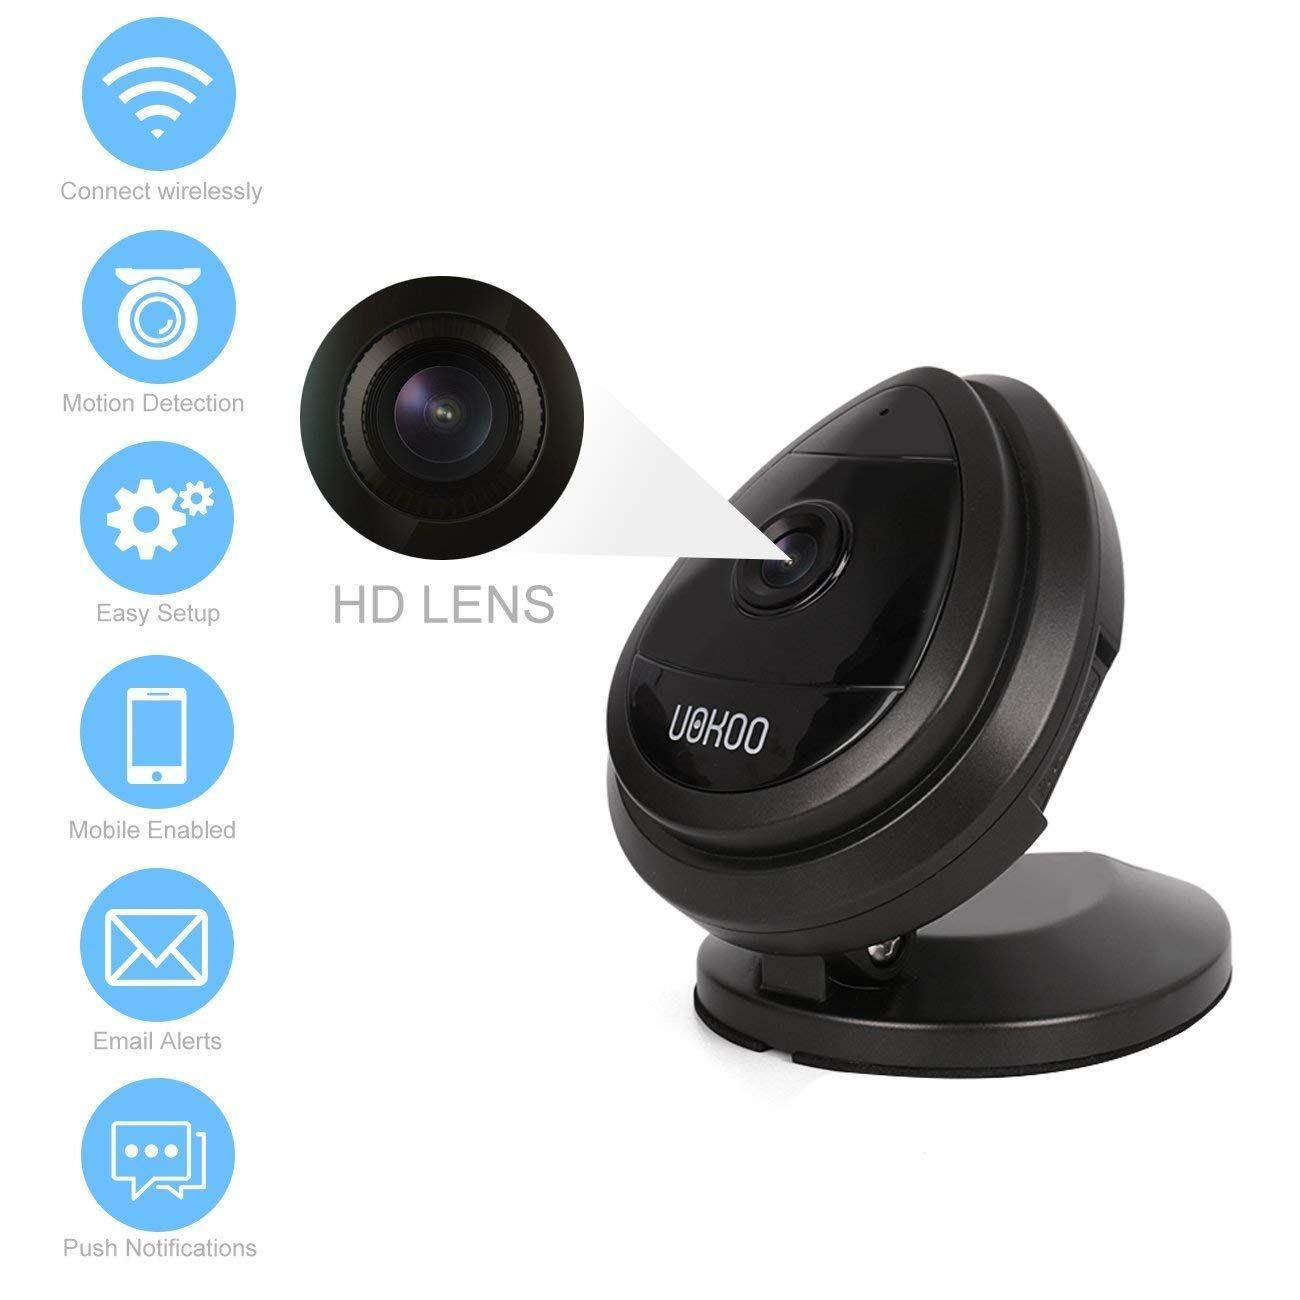 Home Security Camera Wifi Wireless Security Smart Ip Camera Surveillance System Remote Moni Camera Surveillance System Security Cameras For Home Wifi Wireless